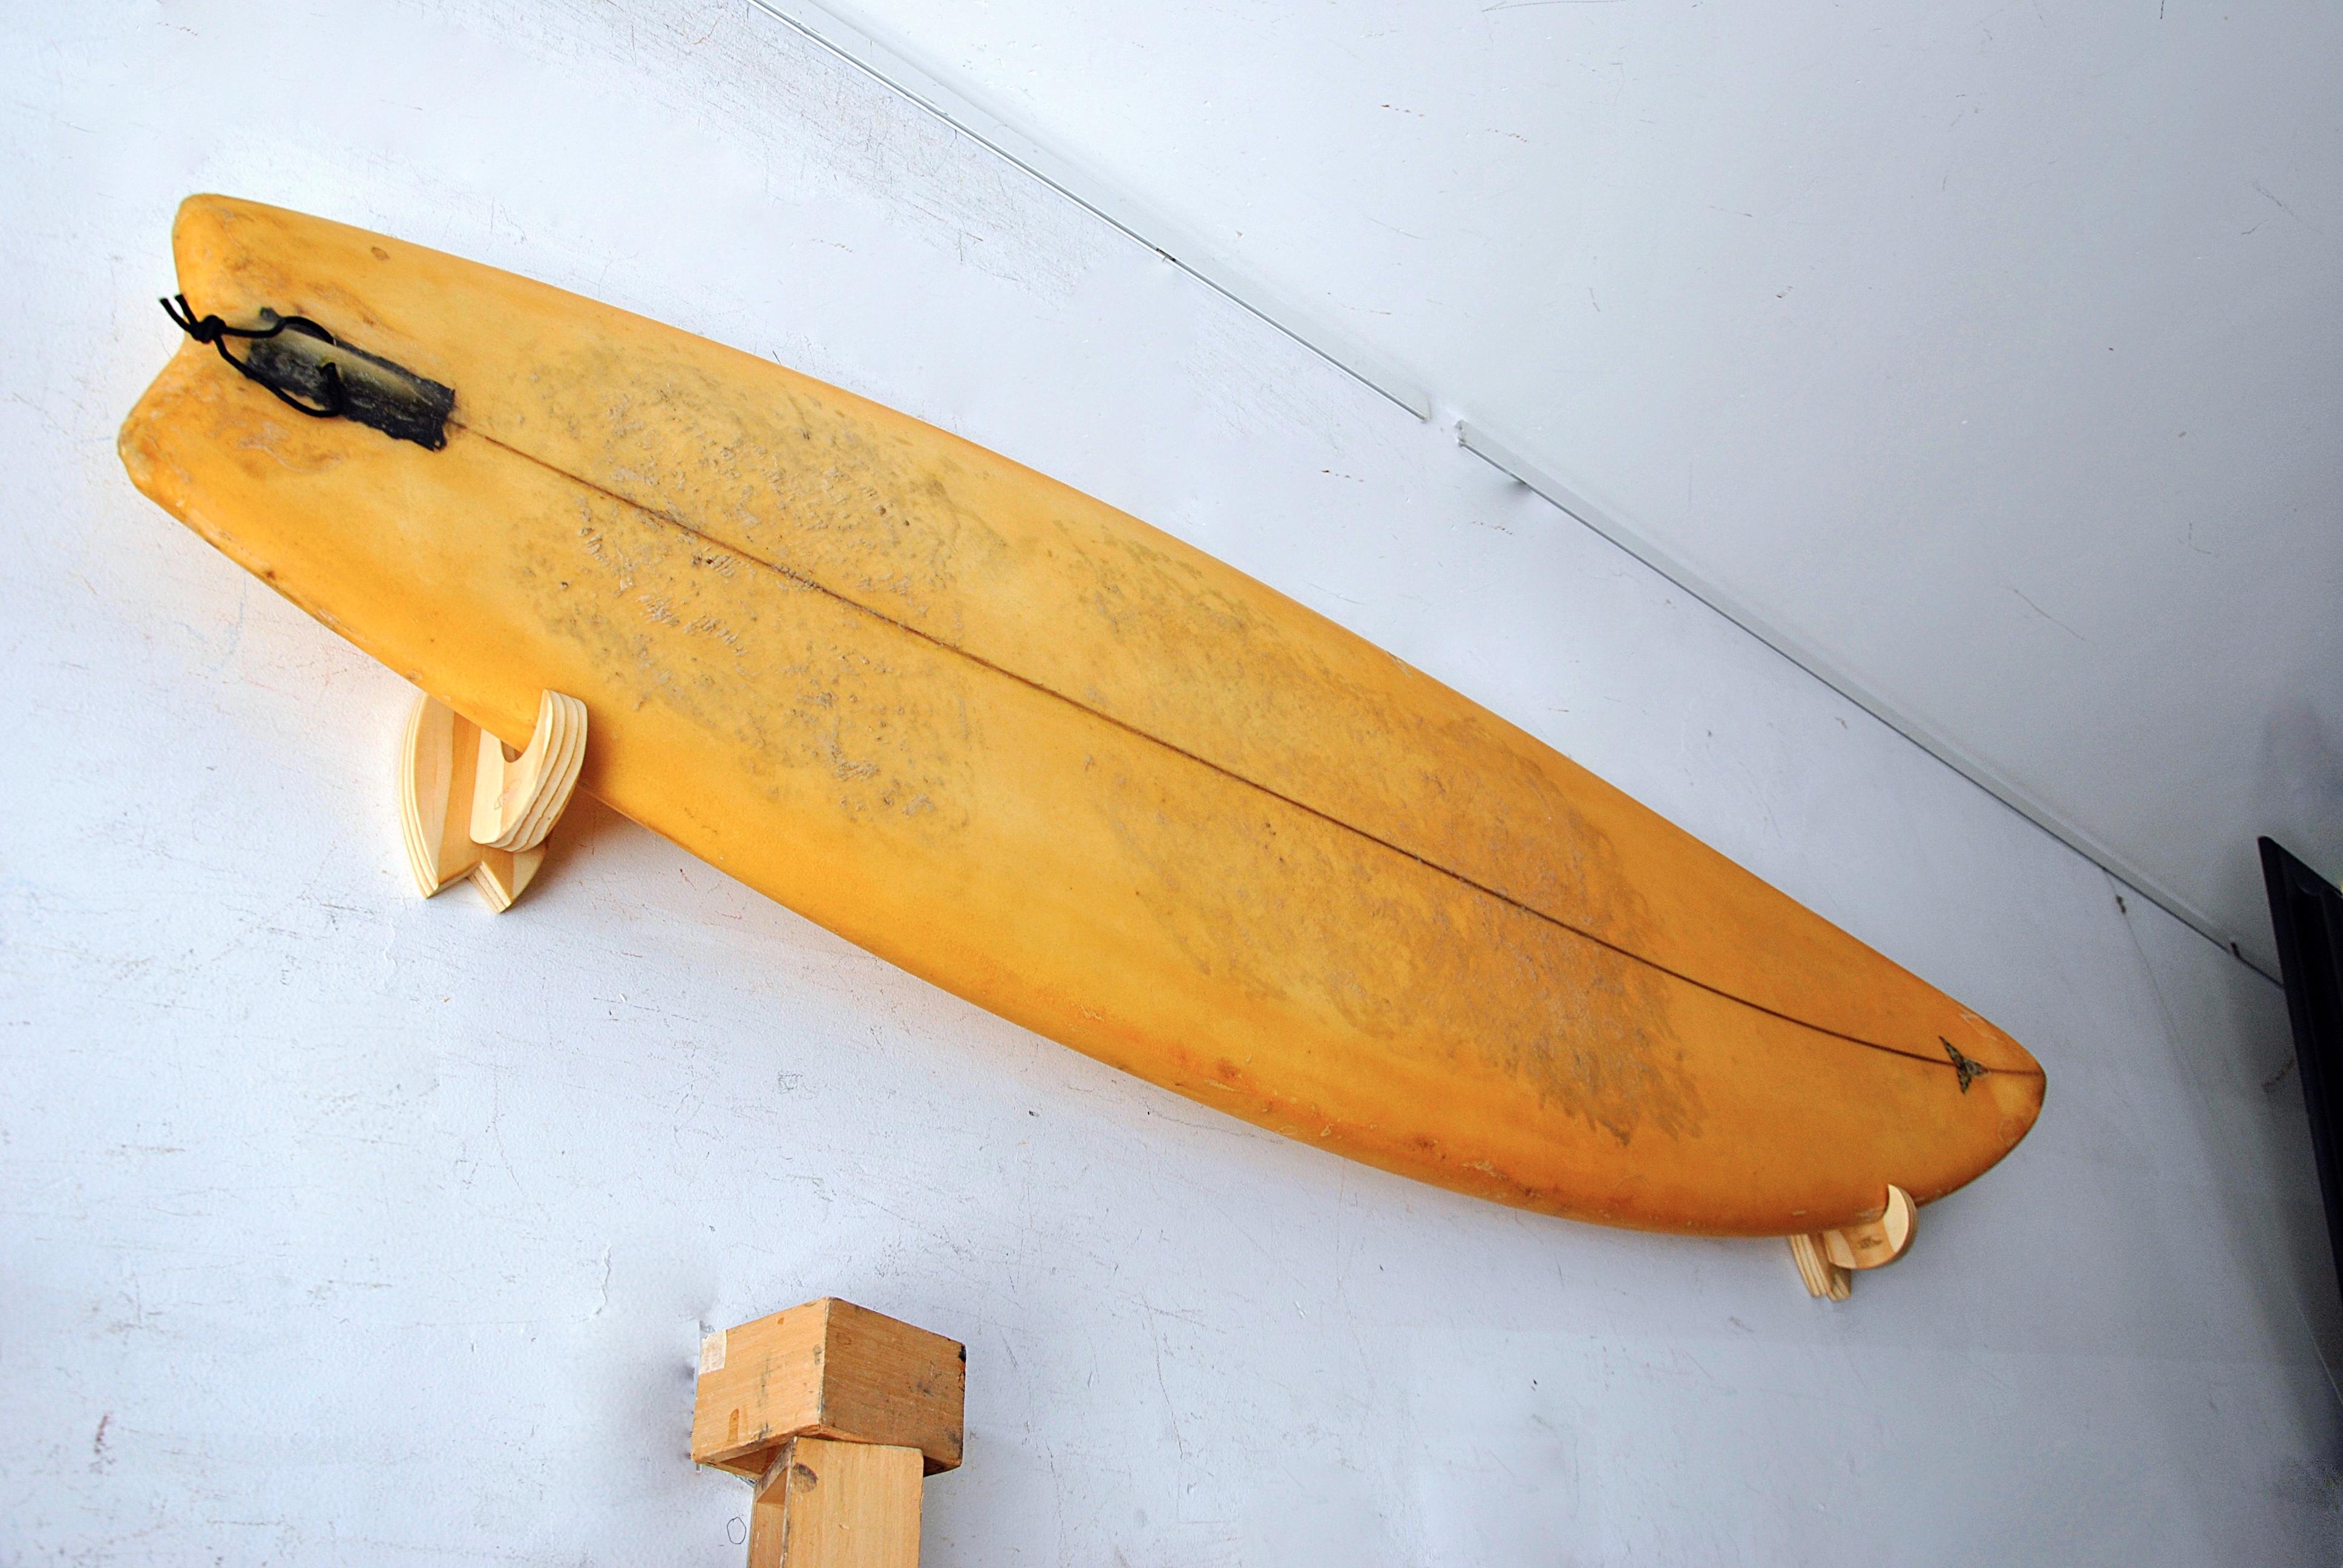 Premium Small Surf Rack for Surfboard, Snow-Wake-Kite and Ski